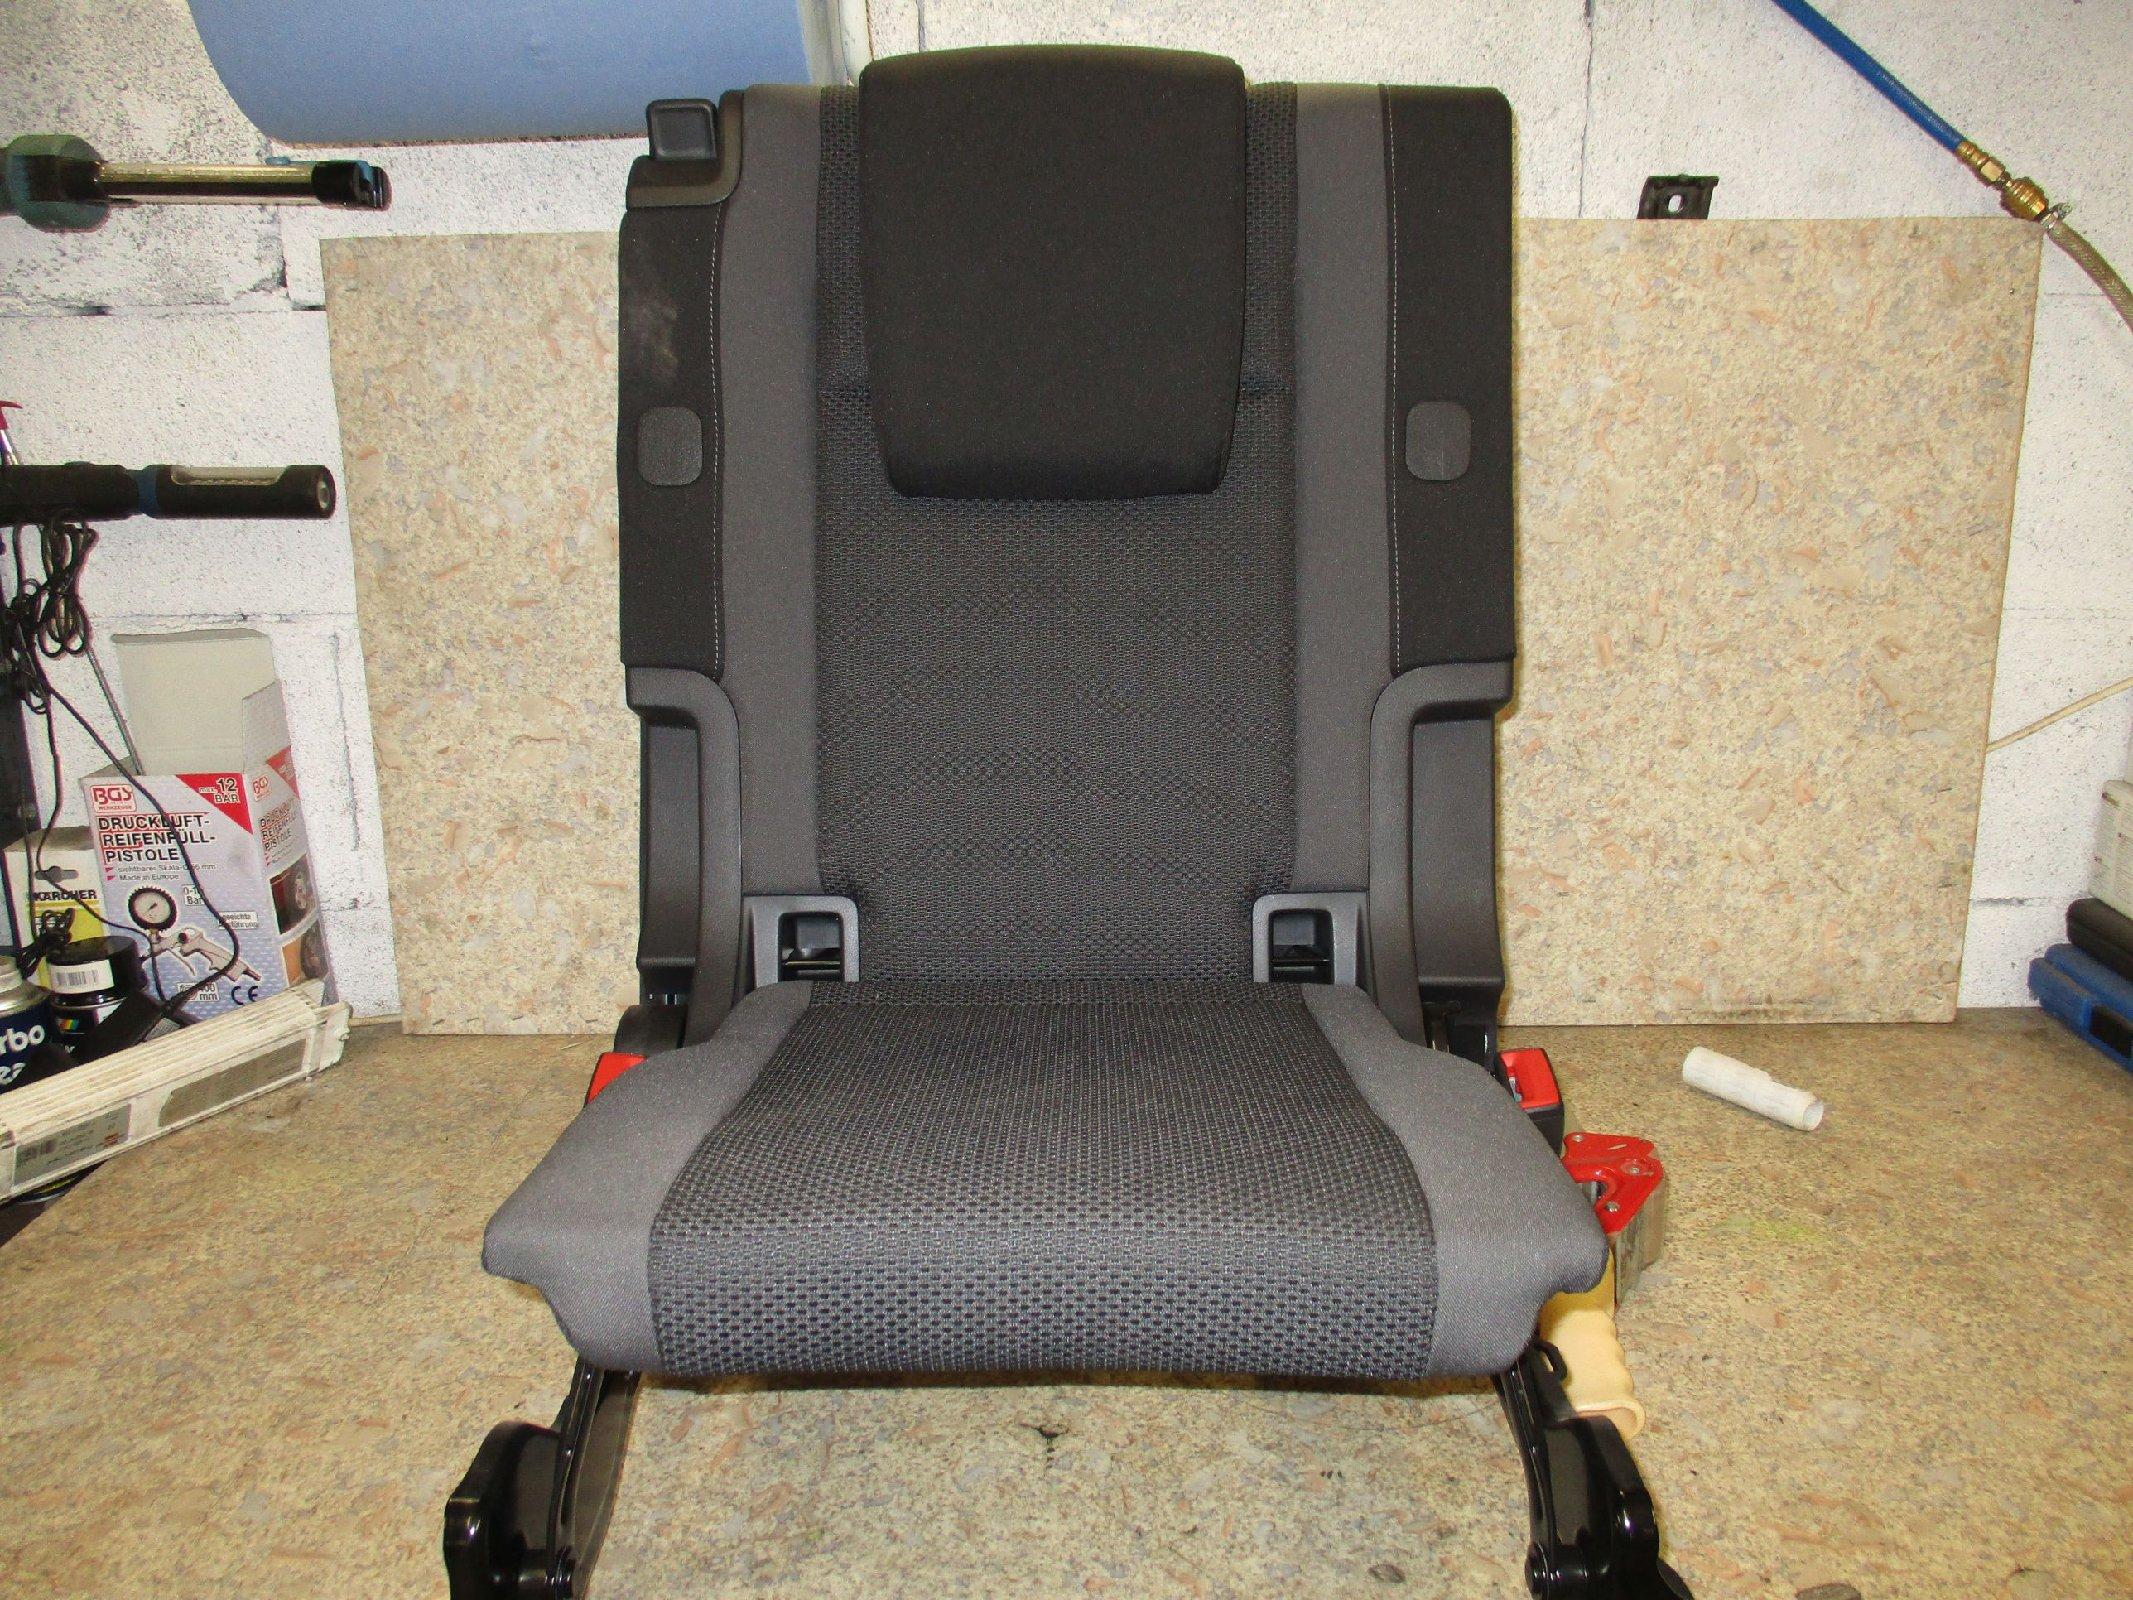 5qa885305 original vw touran 5t einzelsitz 3 sitzreihe. Black Bedroom Furniture Sets. Home Design Ideas